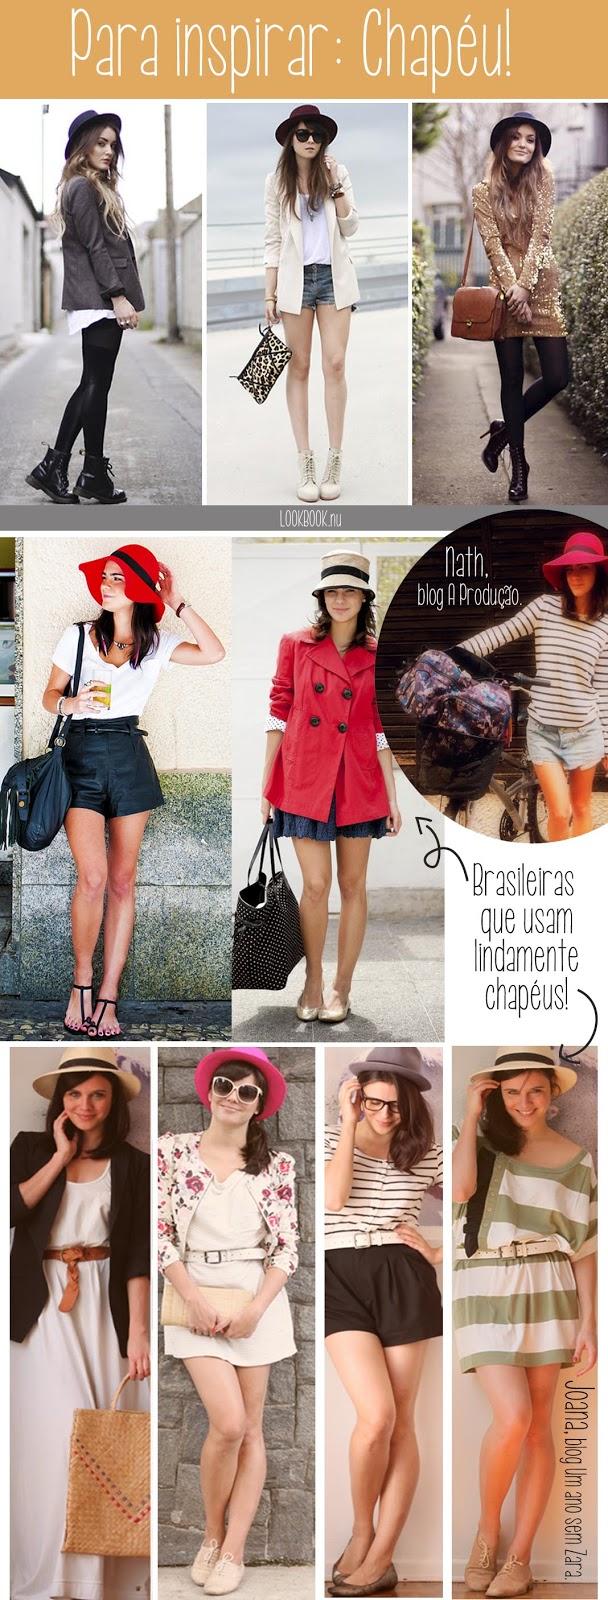 Lookboo.nu, hat, nath a produção, joana um ano sem zara, moda, estilo